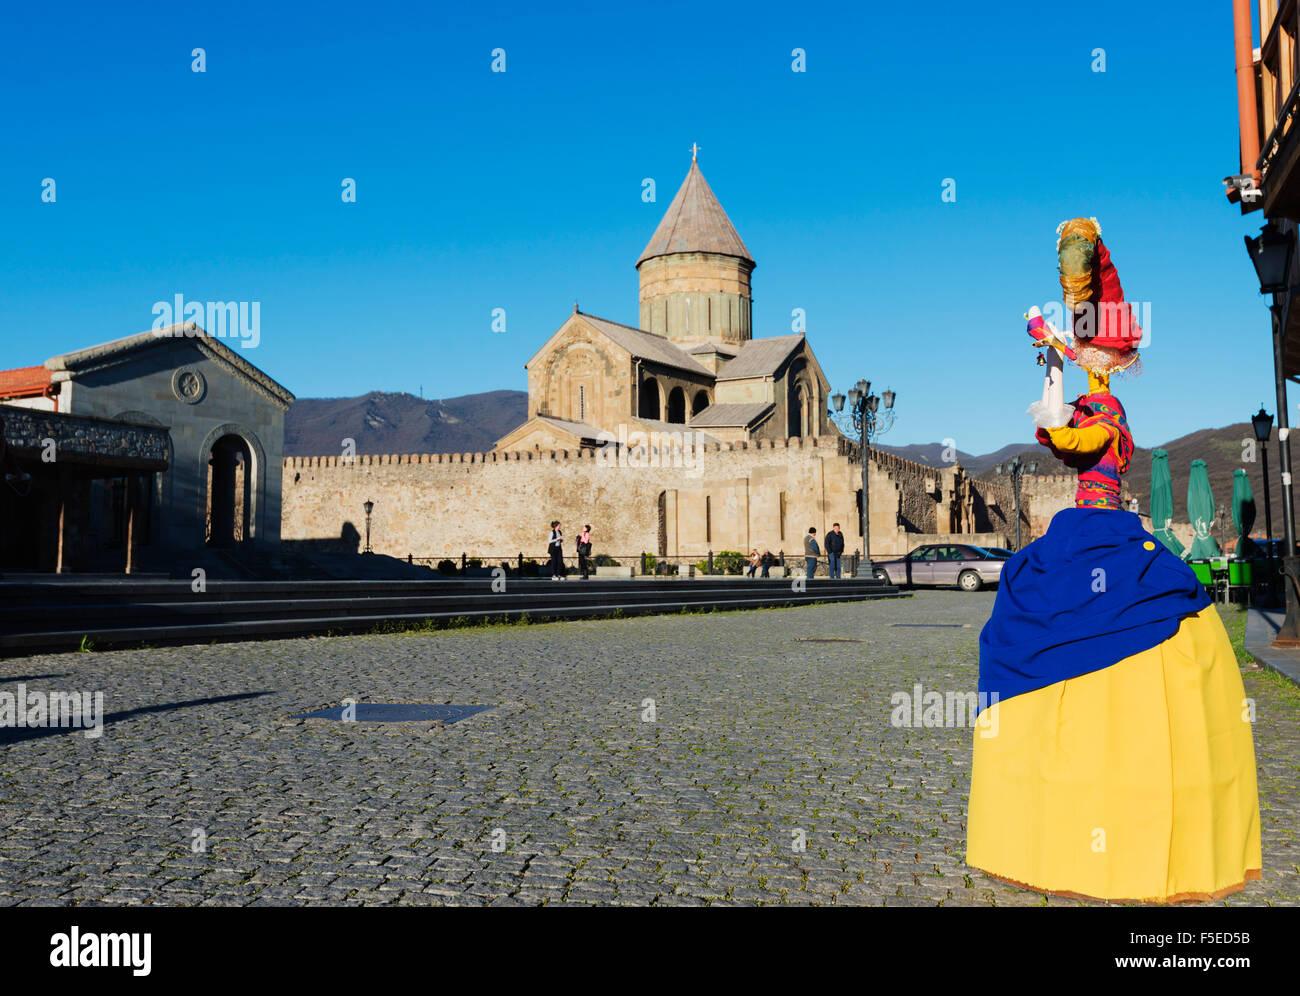 Artigiani locali display bambola, Cattedrale di Svetitskhoveli, XI secolo, da Patriach Melkisedek, Mtskheta, Georgia, Immagini Stock